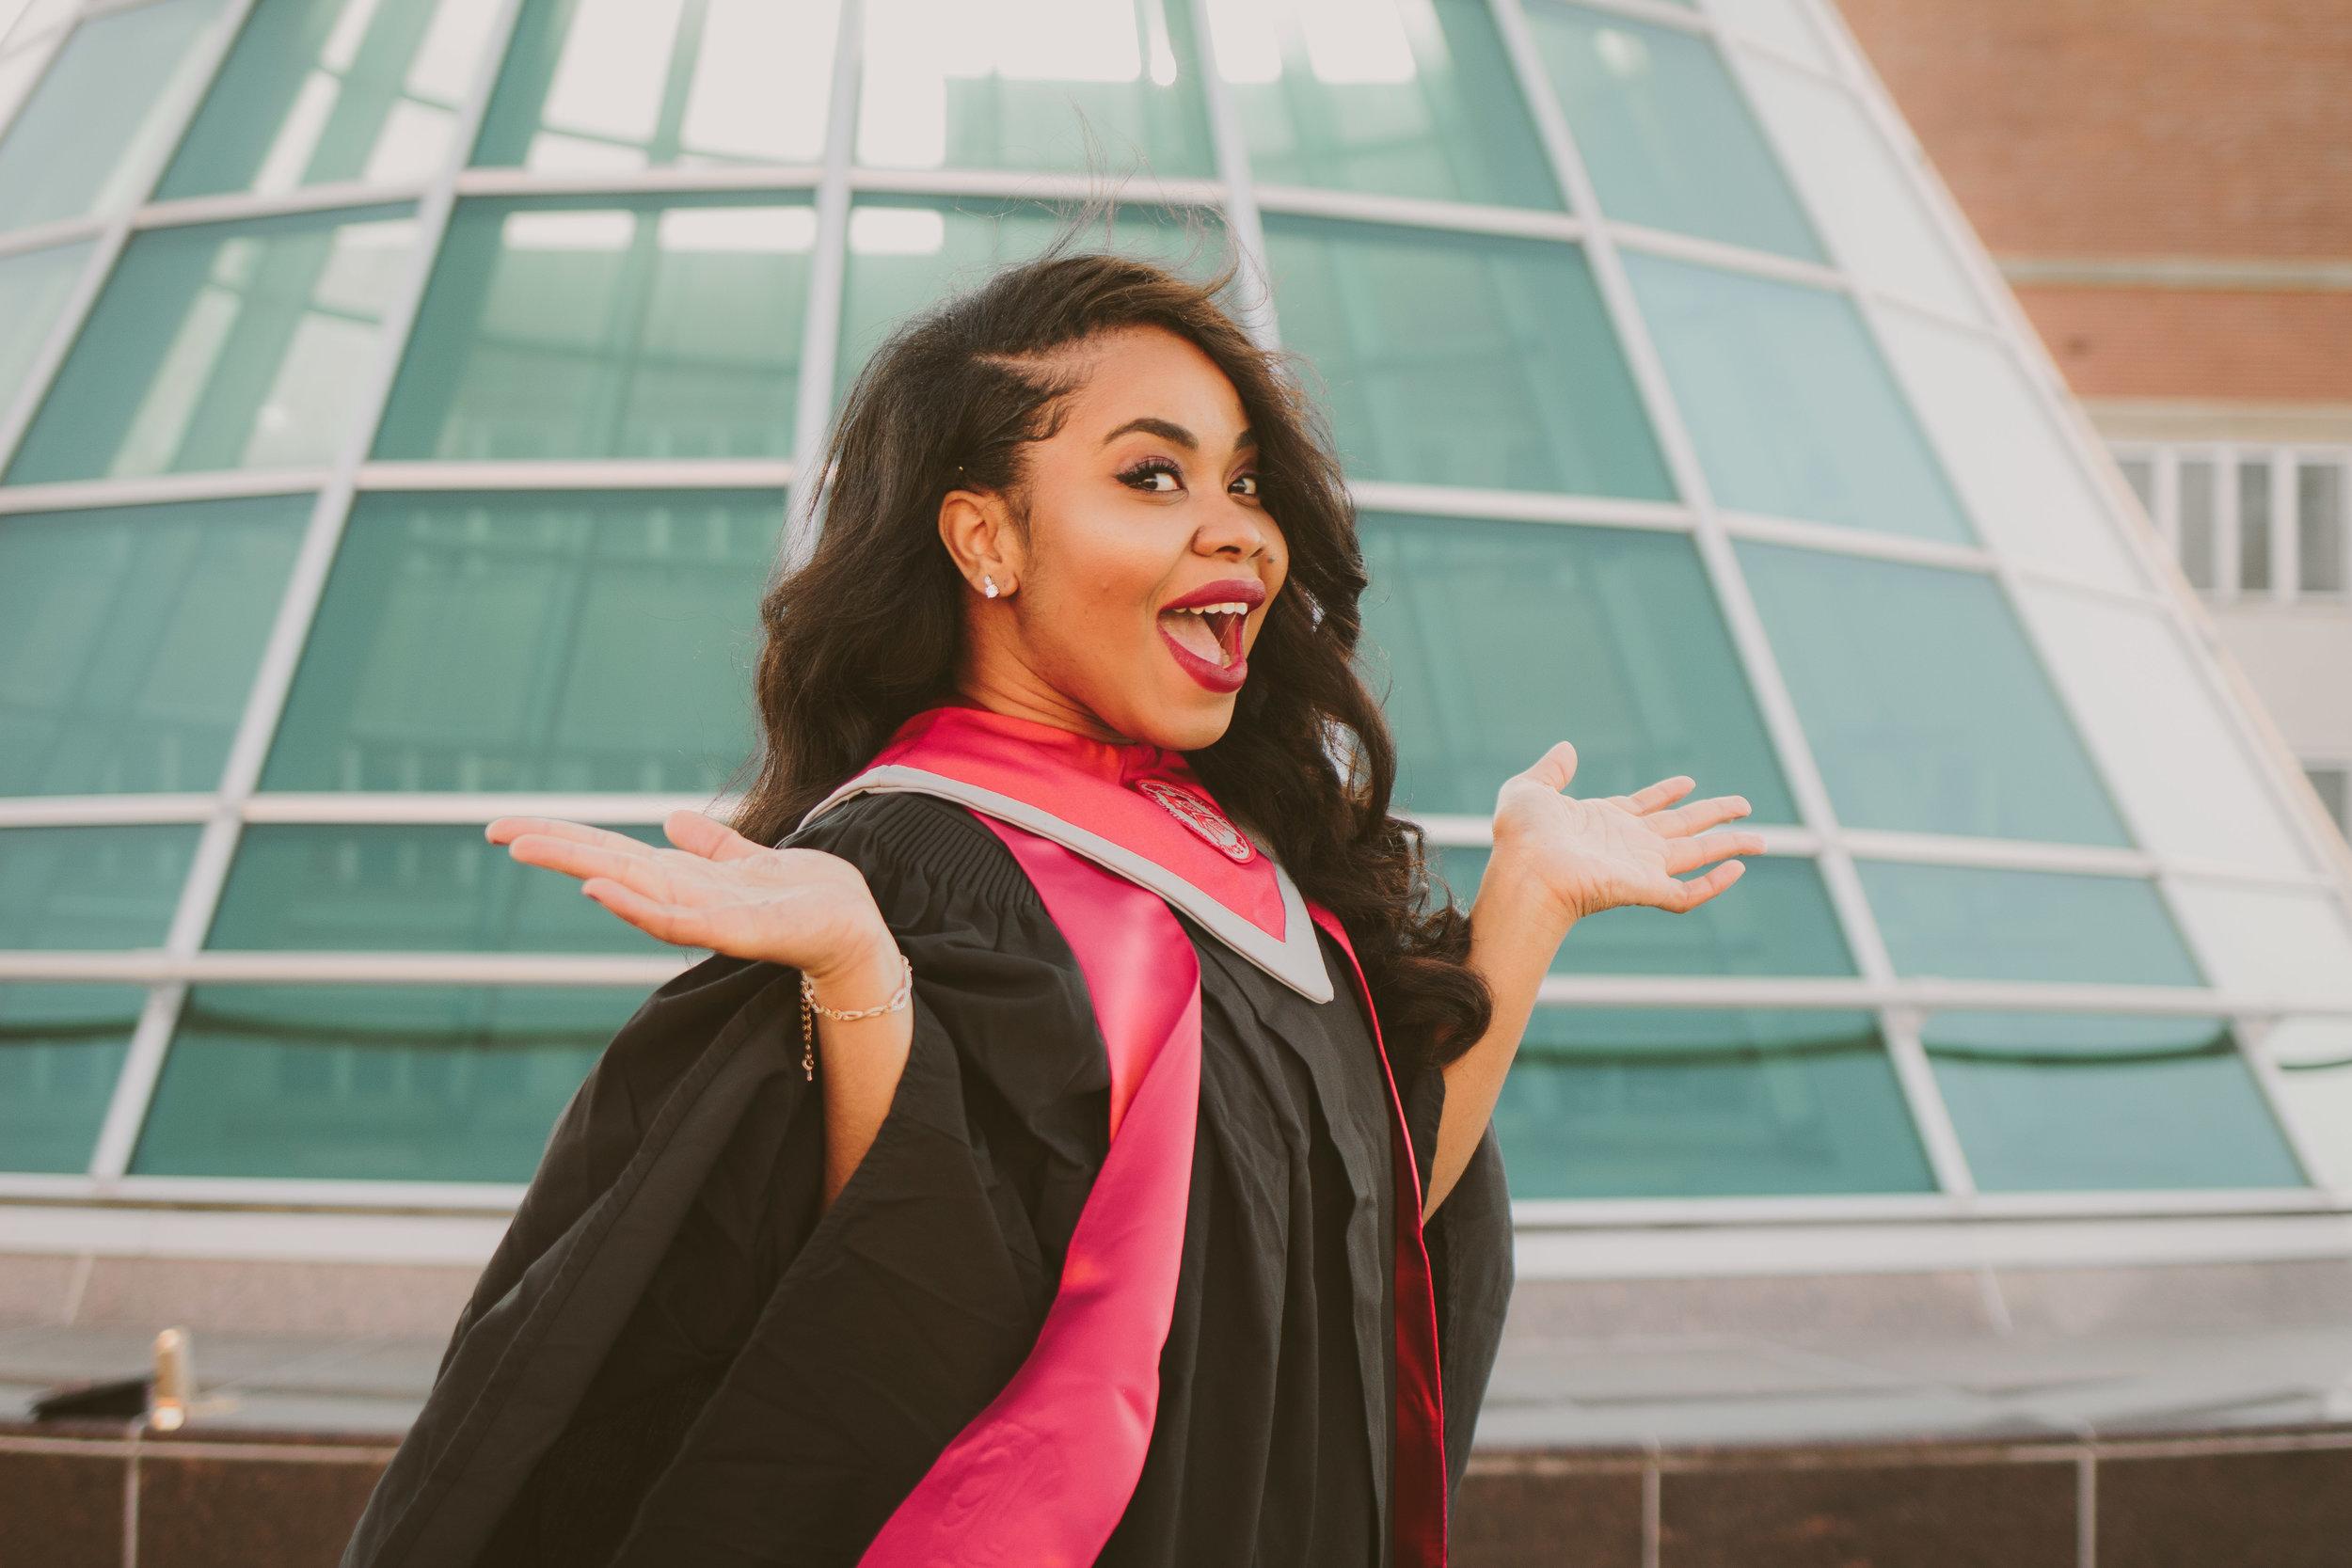 Ana_graduation-11.jpg